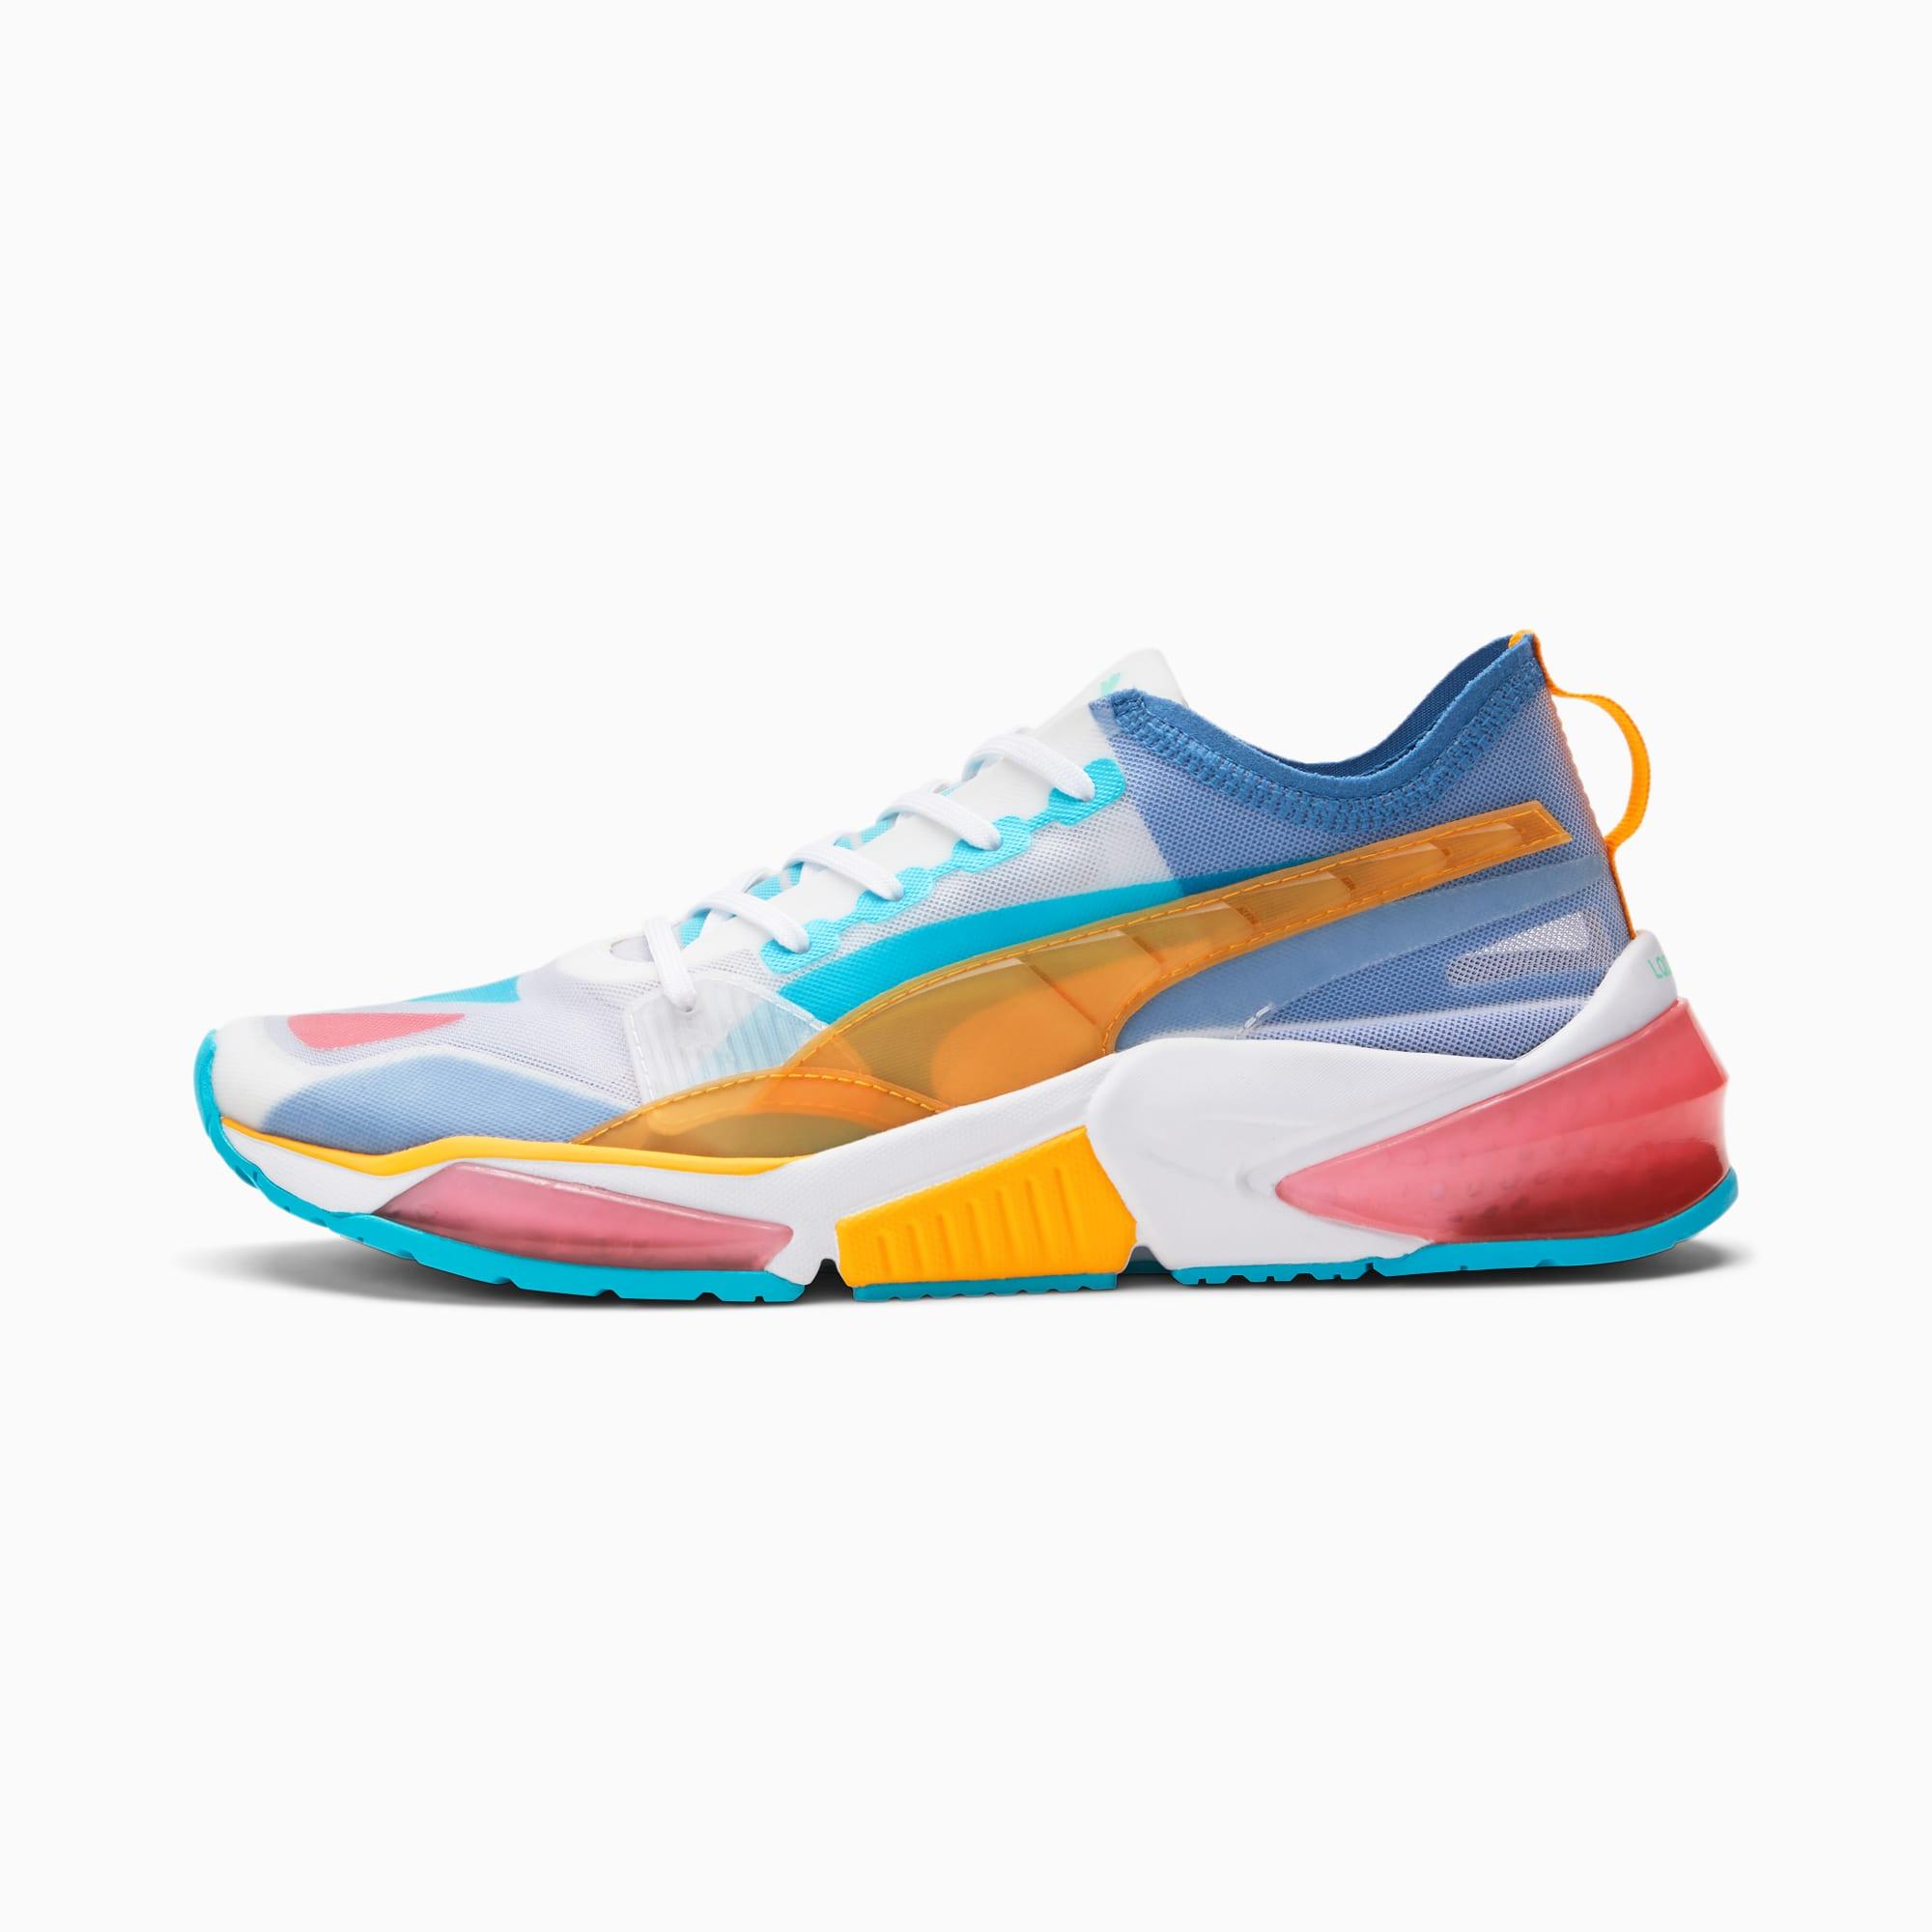 PUMA LQDCELL Optic Sheer Men's Training Shoes (White-Zinnia-Star Sapphire)